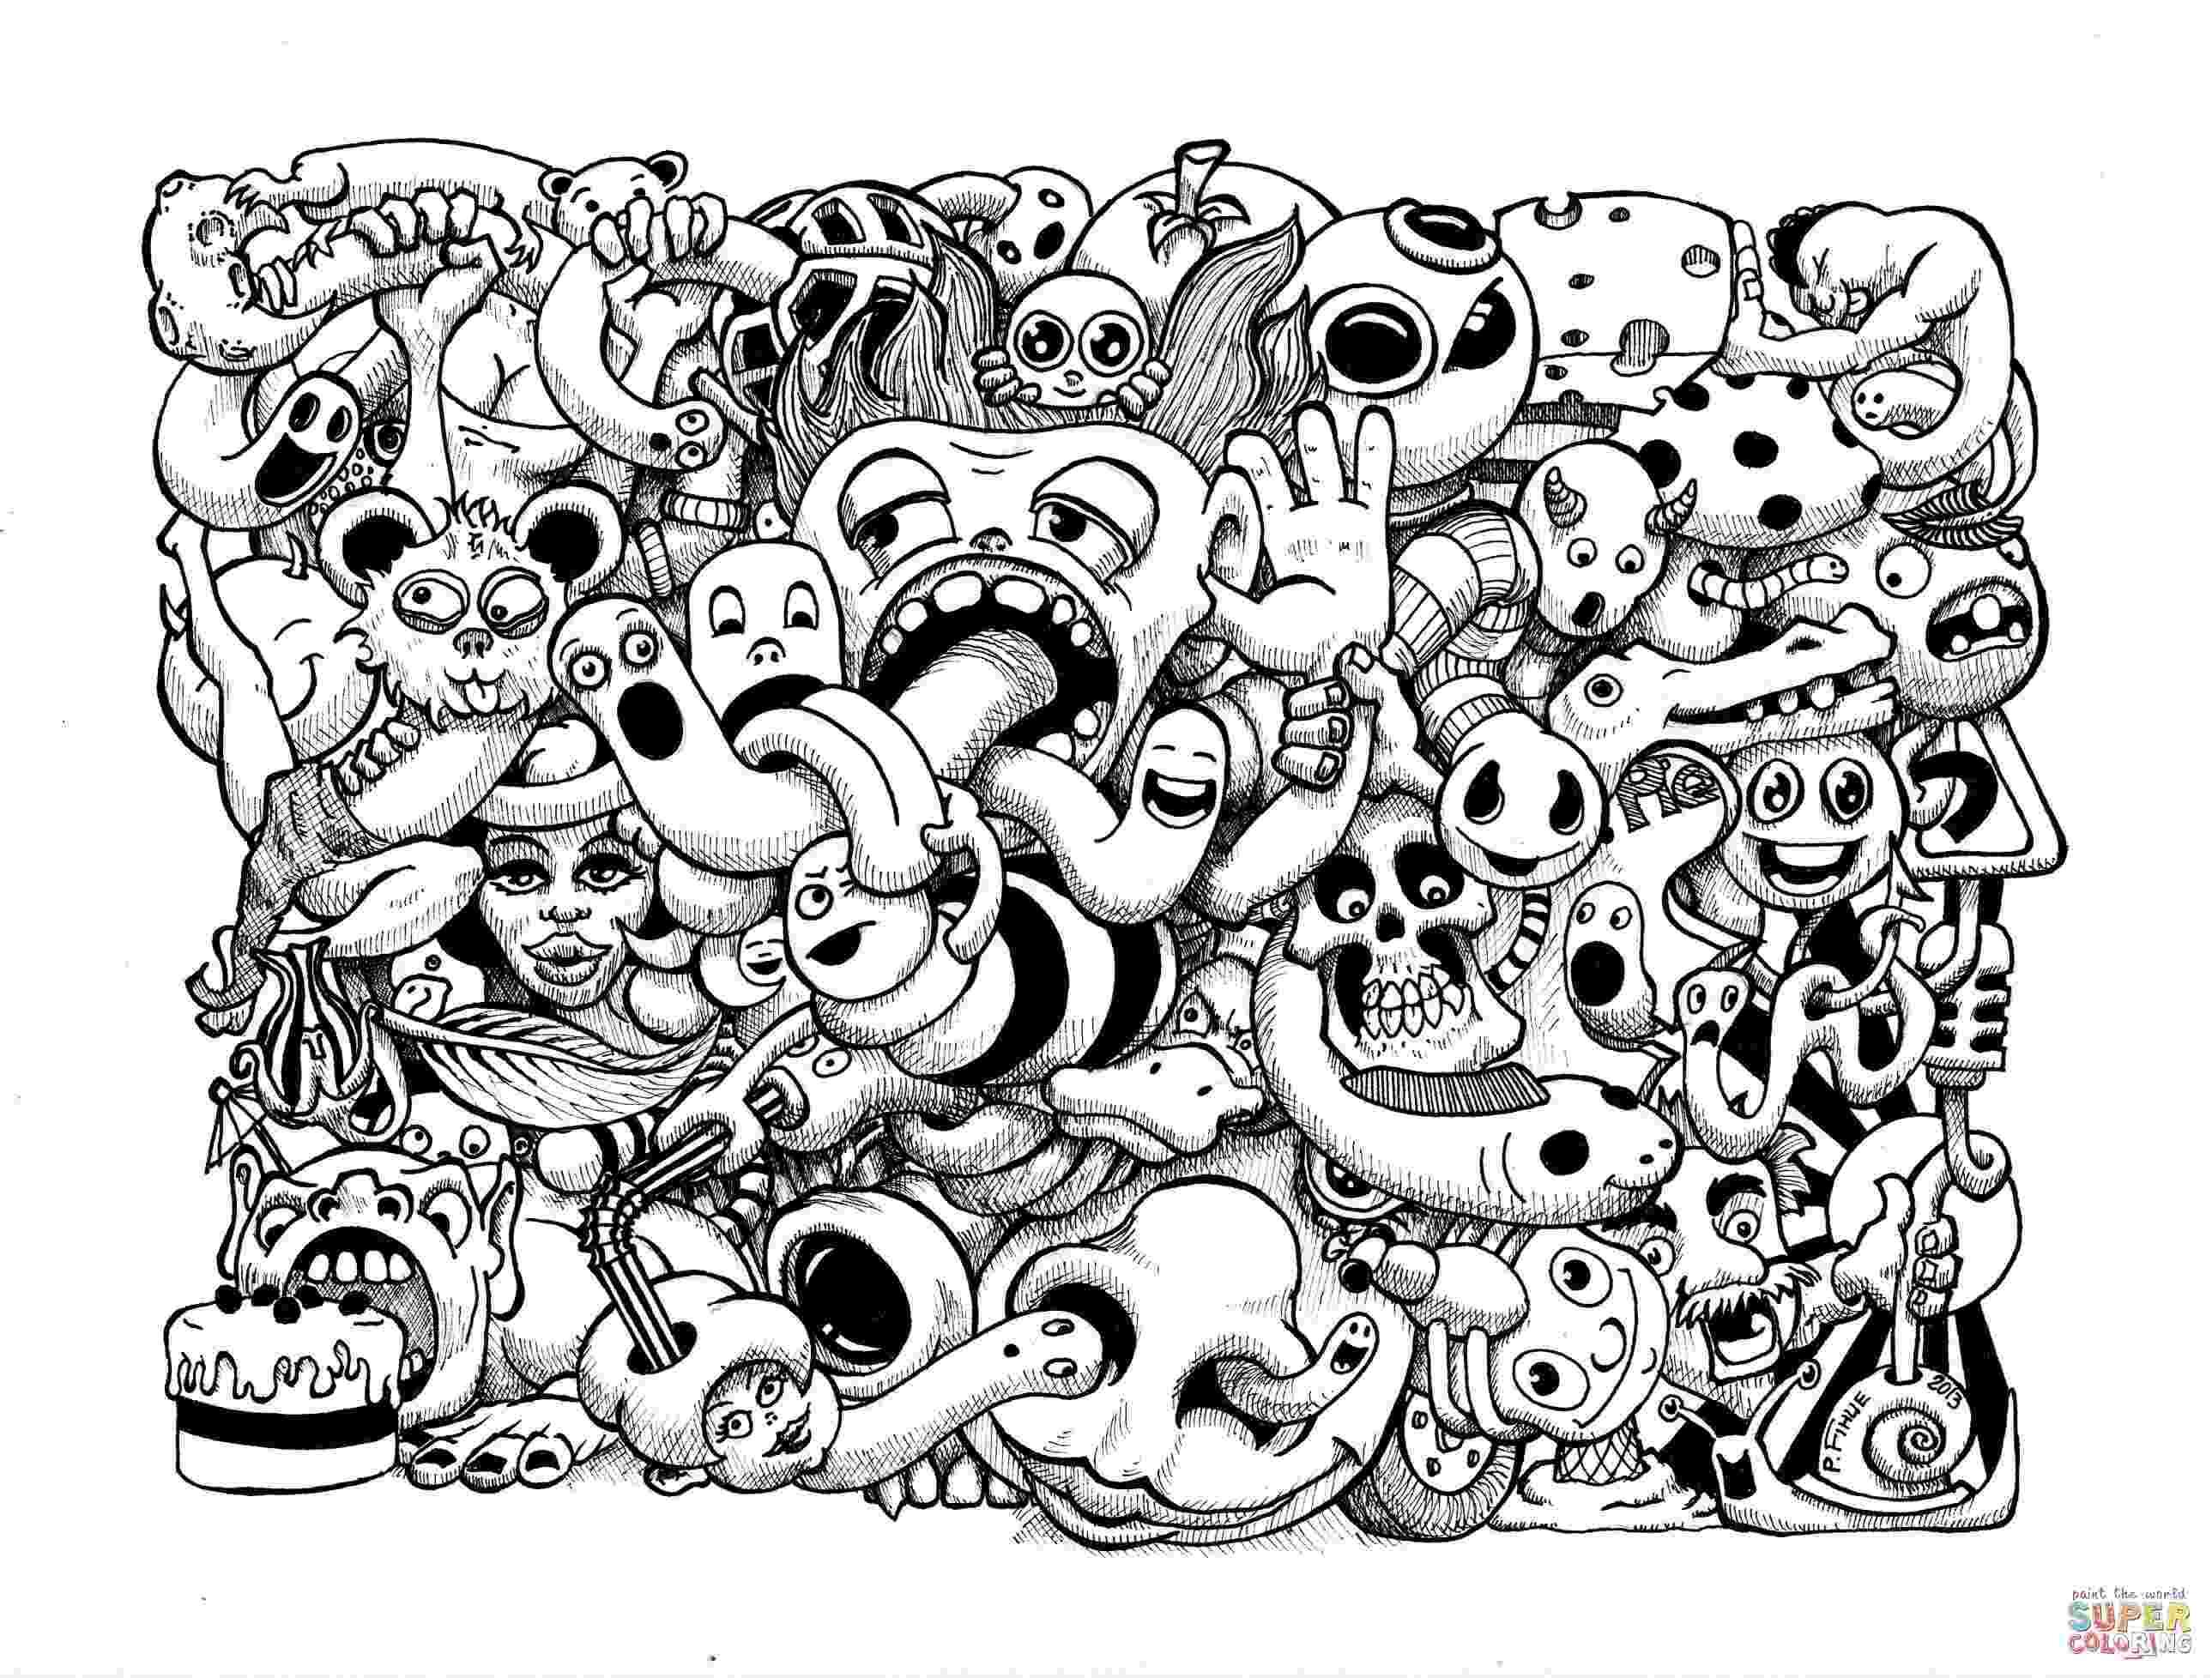 doodle art colouring doodle art doodling 2 doodle art doodling adult doodle colouring art